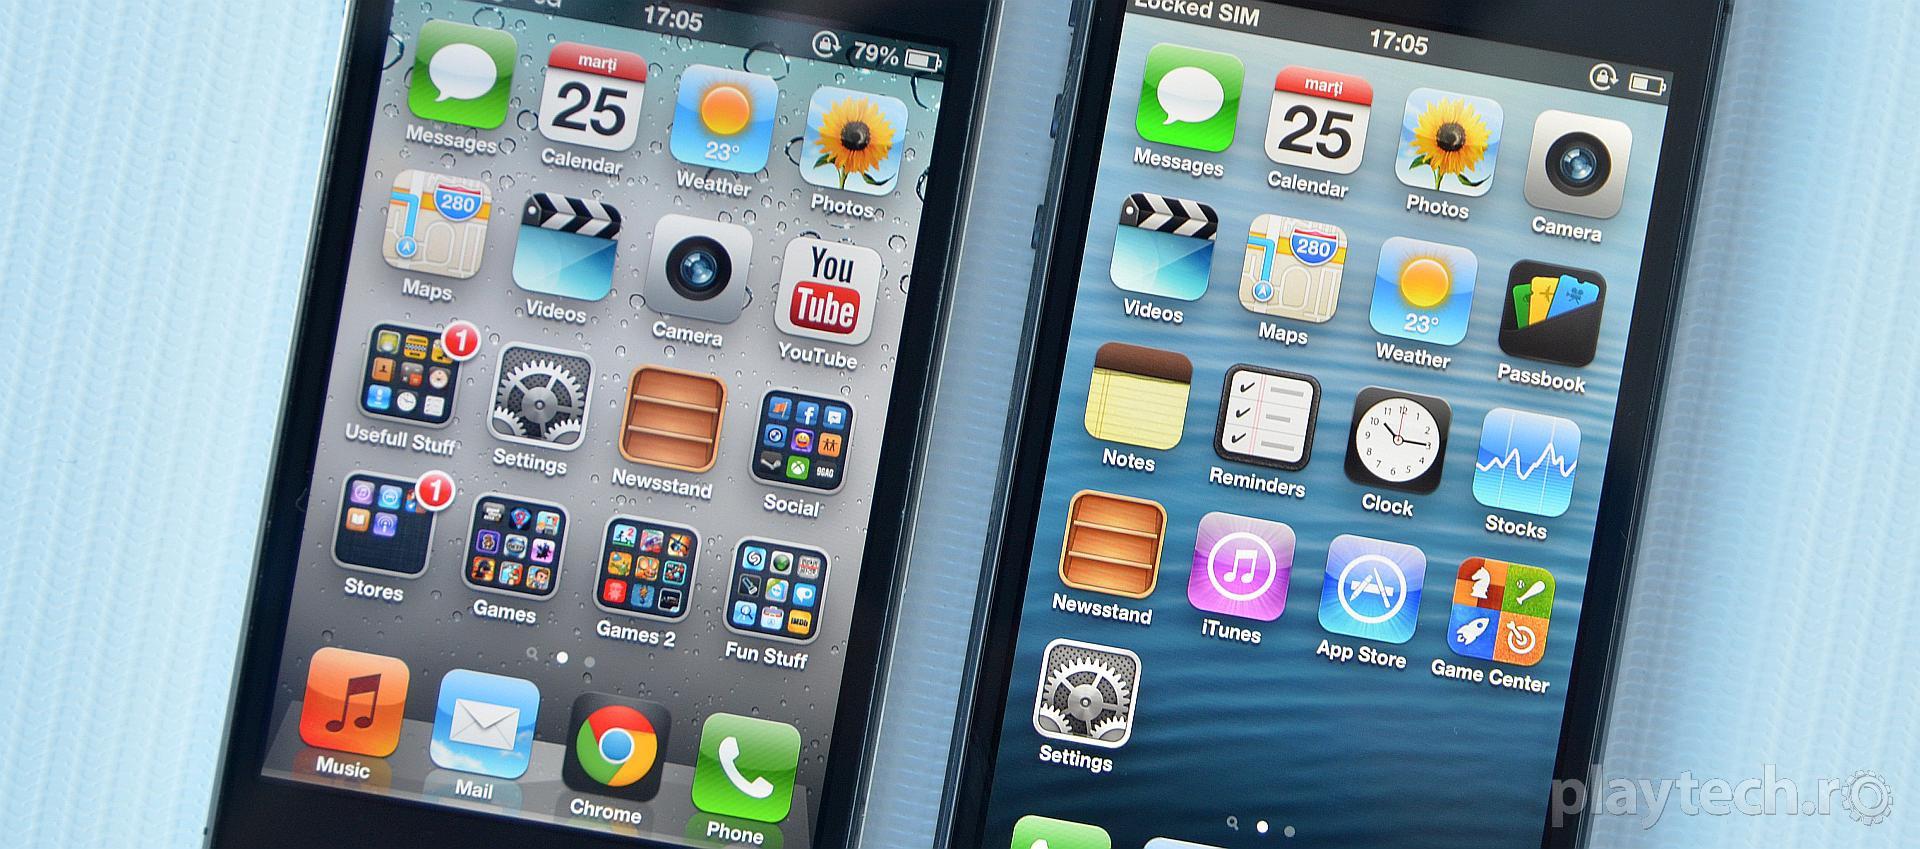 iPhone 5, acum si aici sub lupa Playtech